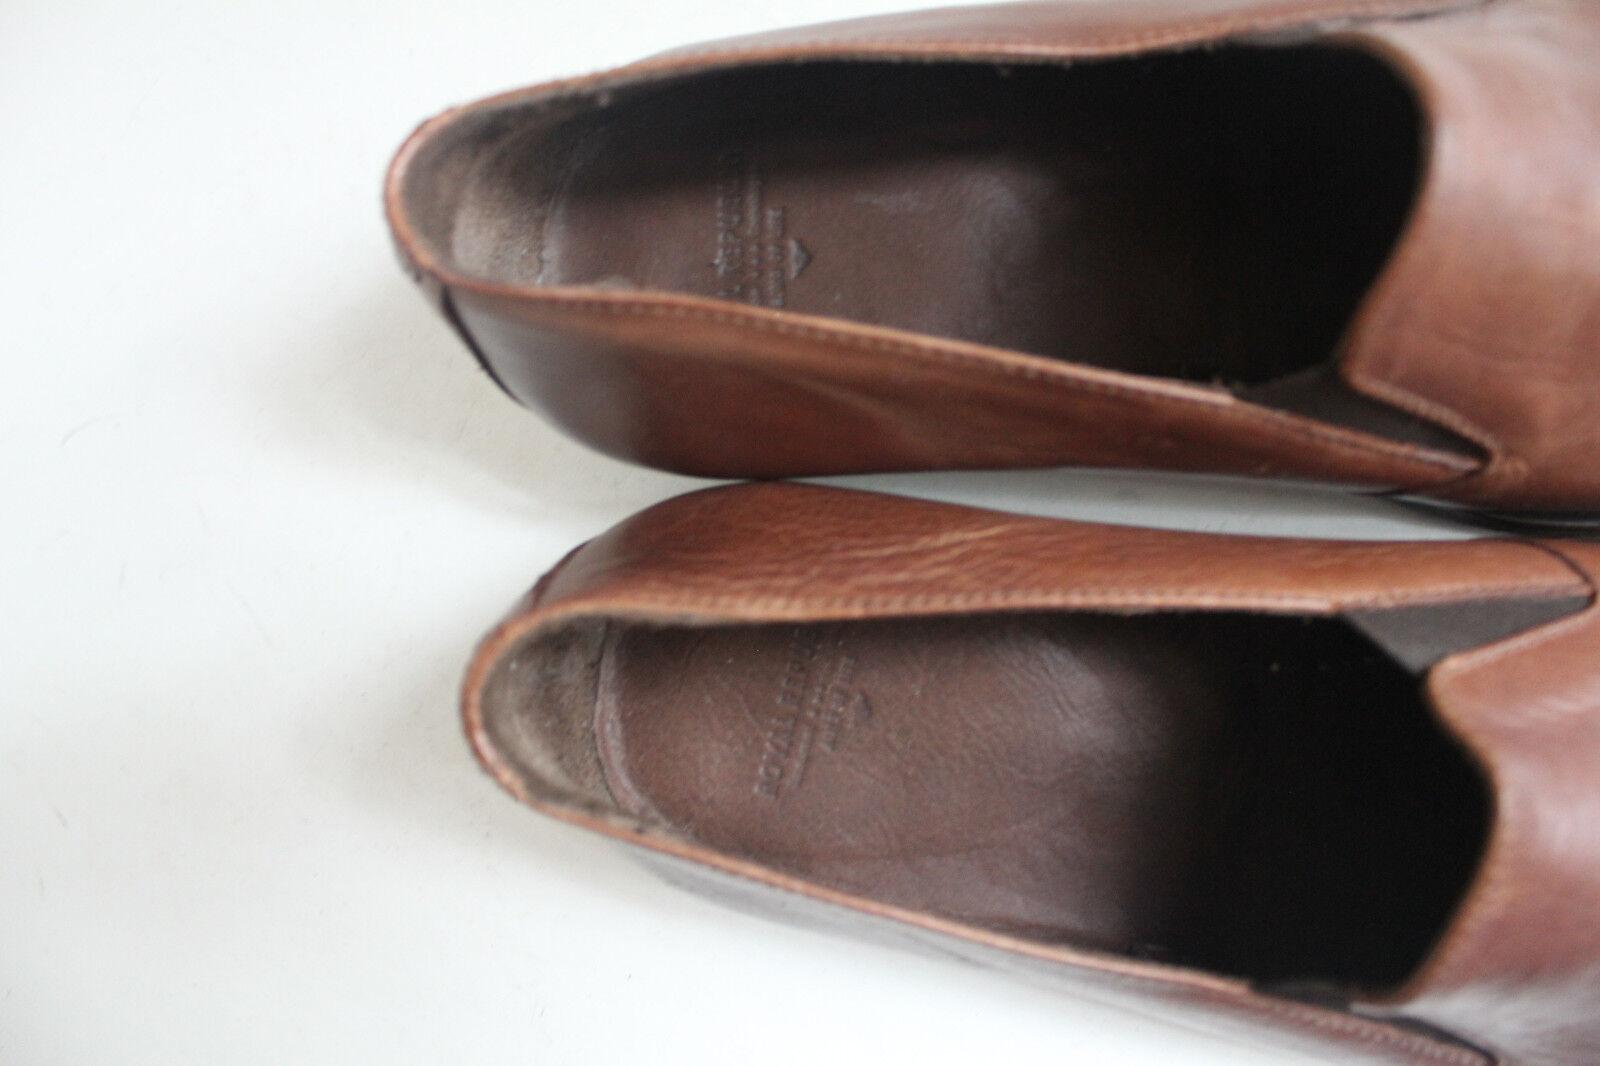 ROYAL REPUBLIC Amsterdam-Copenhagen Pantoufles Chaussures Plein Véritable Cuir 42,5-wie NEUF NEUF NEUF 386989